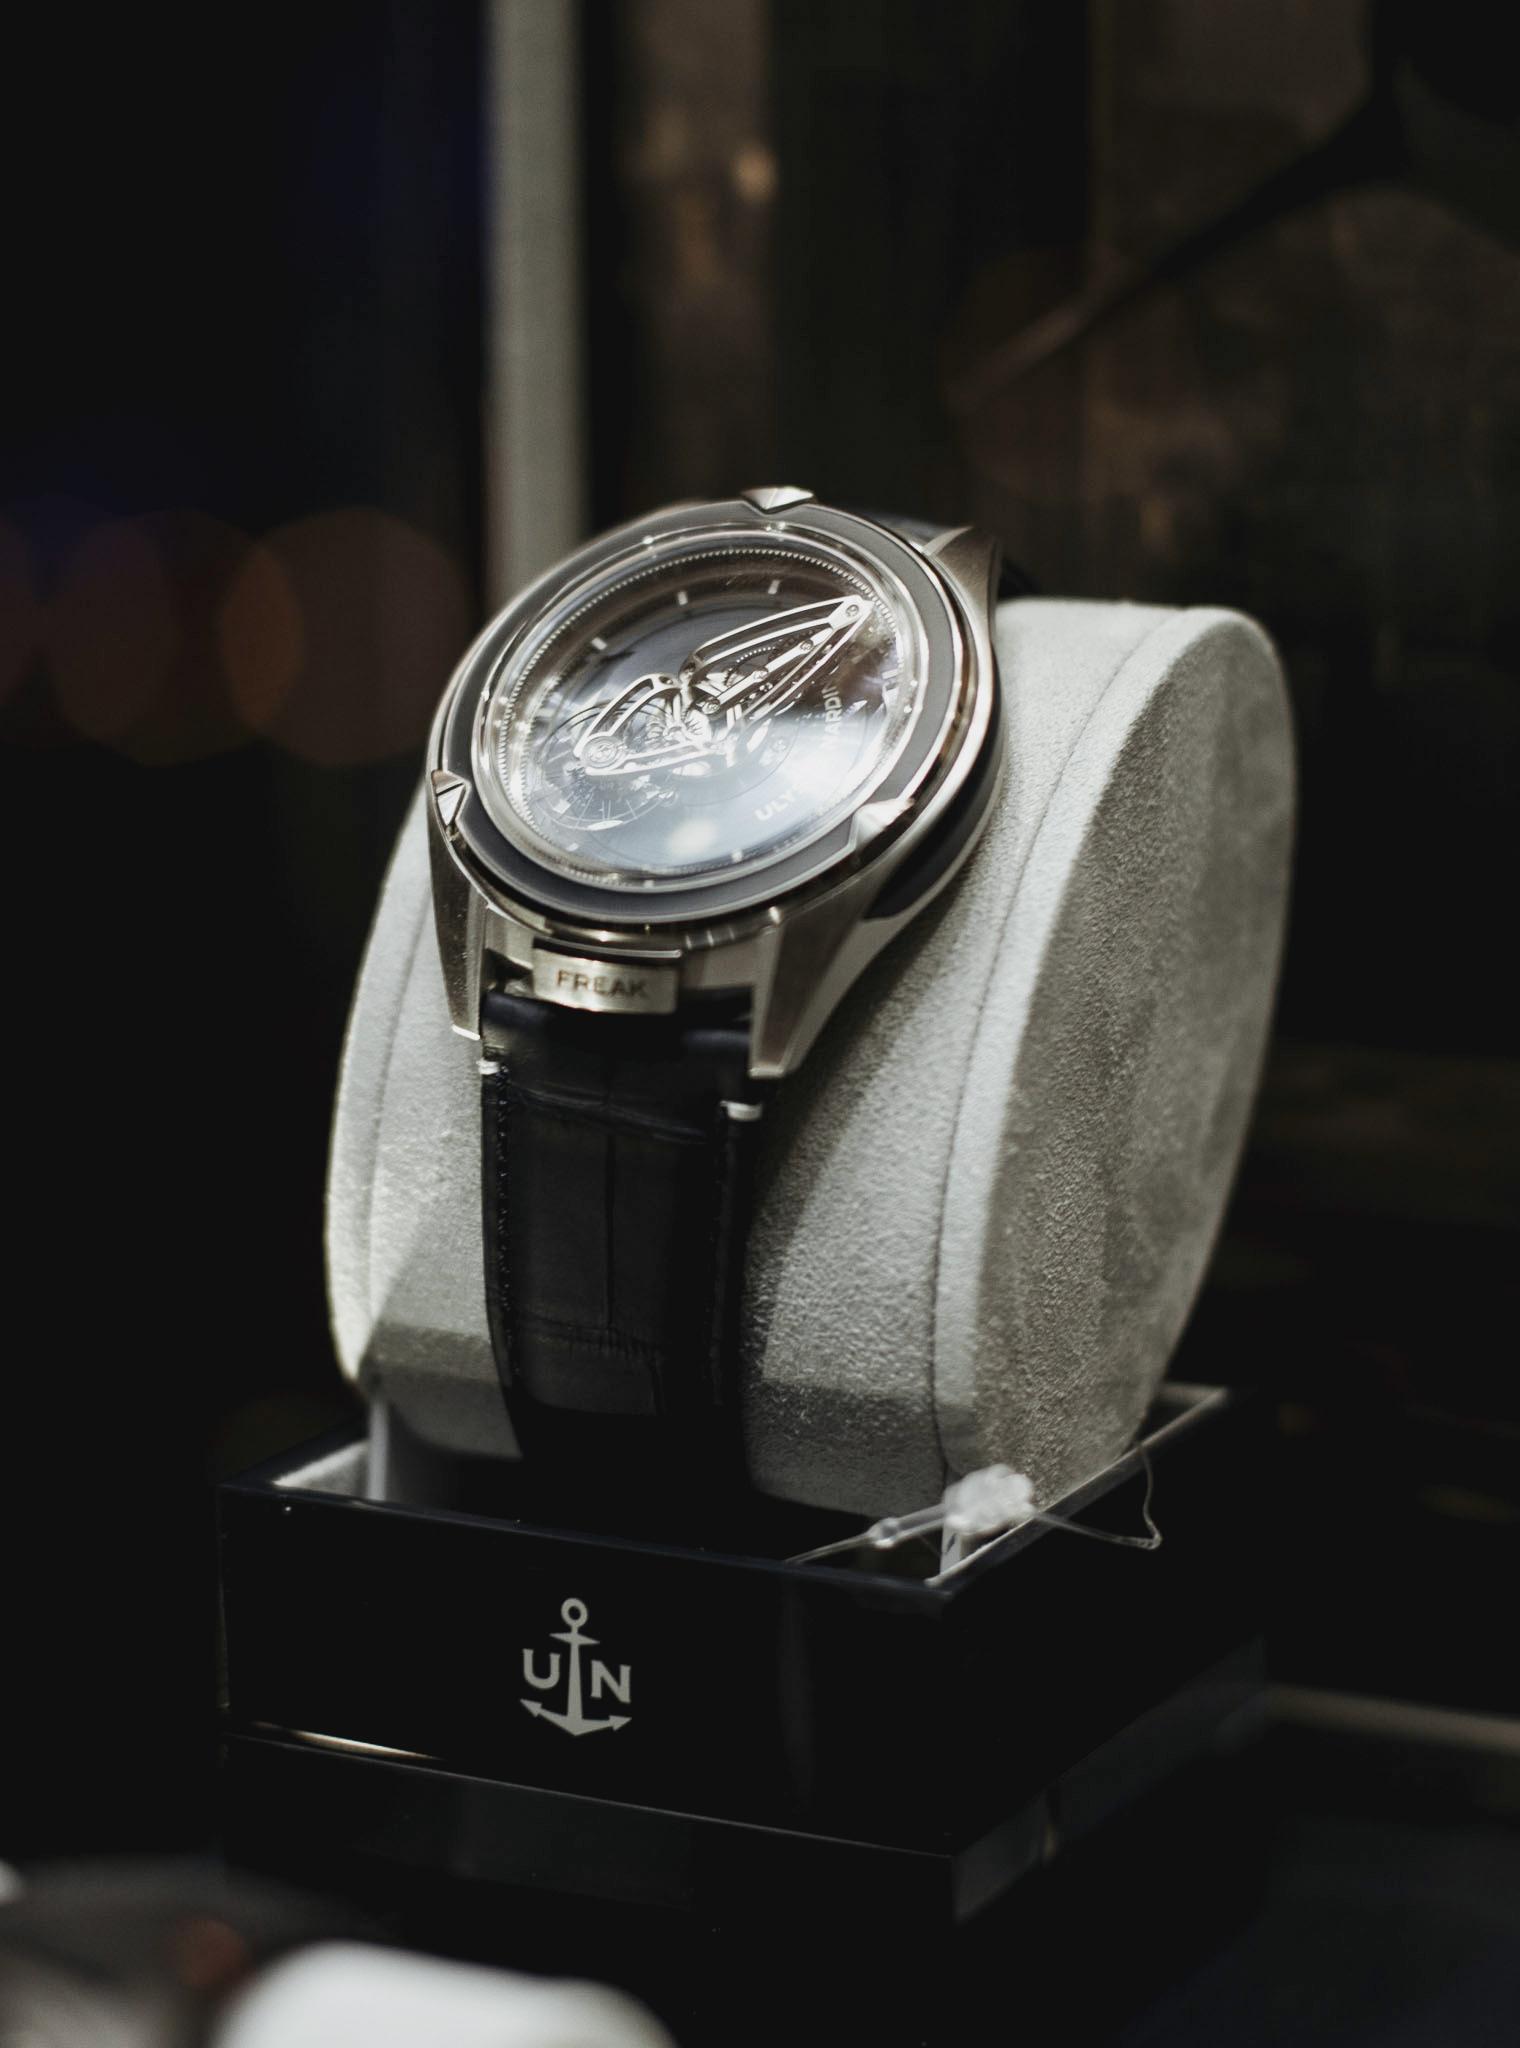 UNroyaljewelers789.JPG